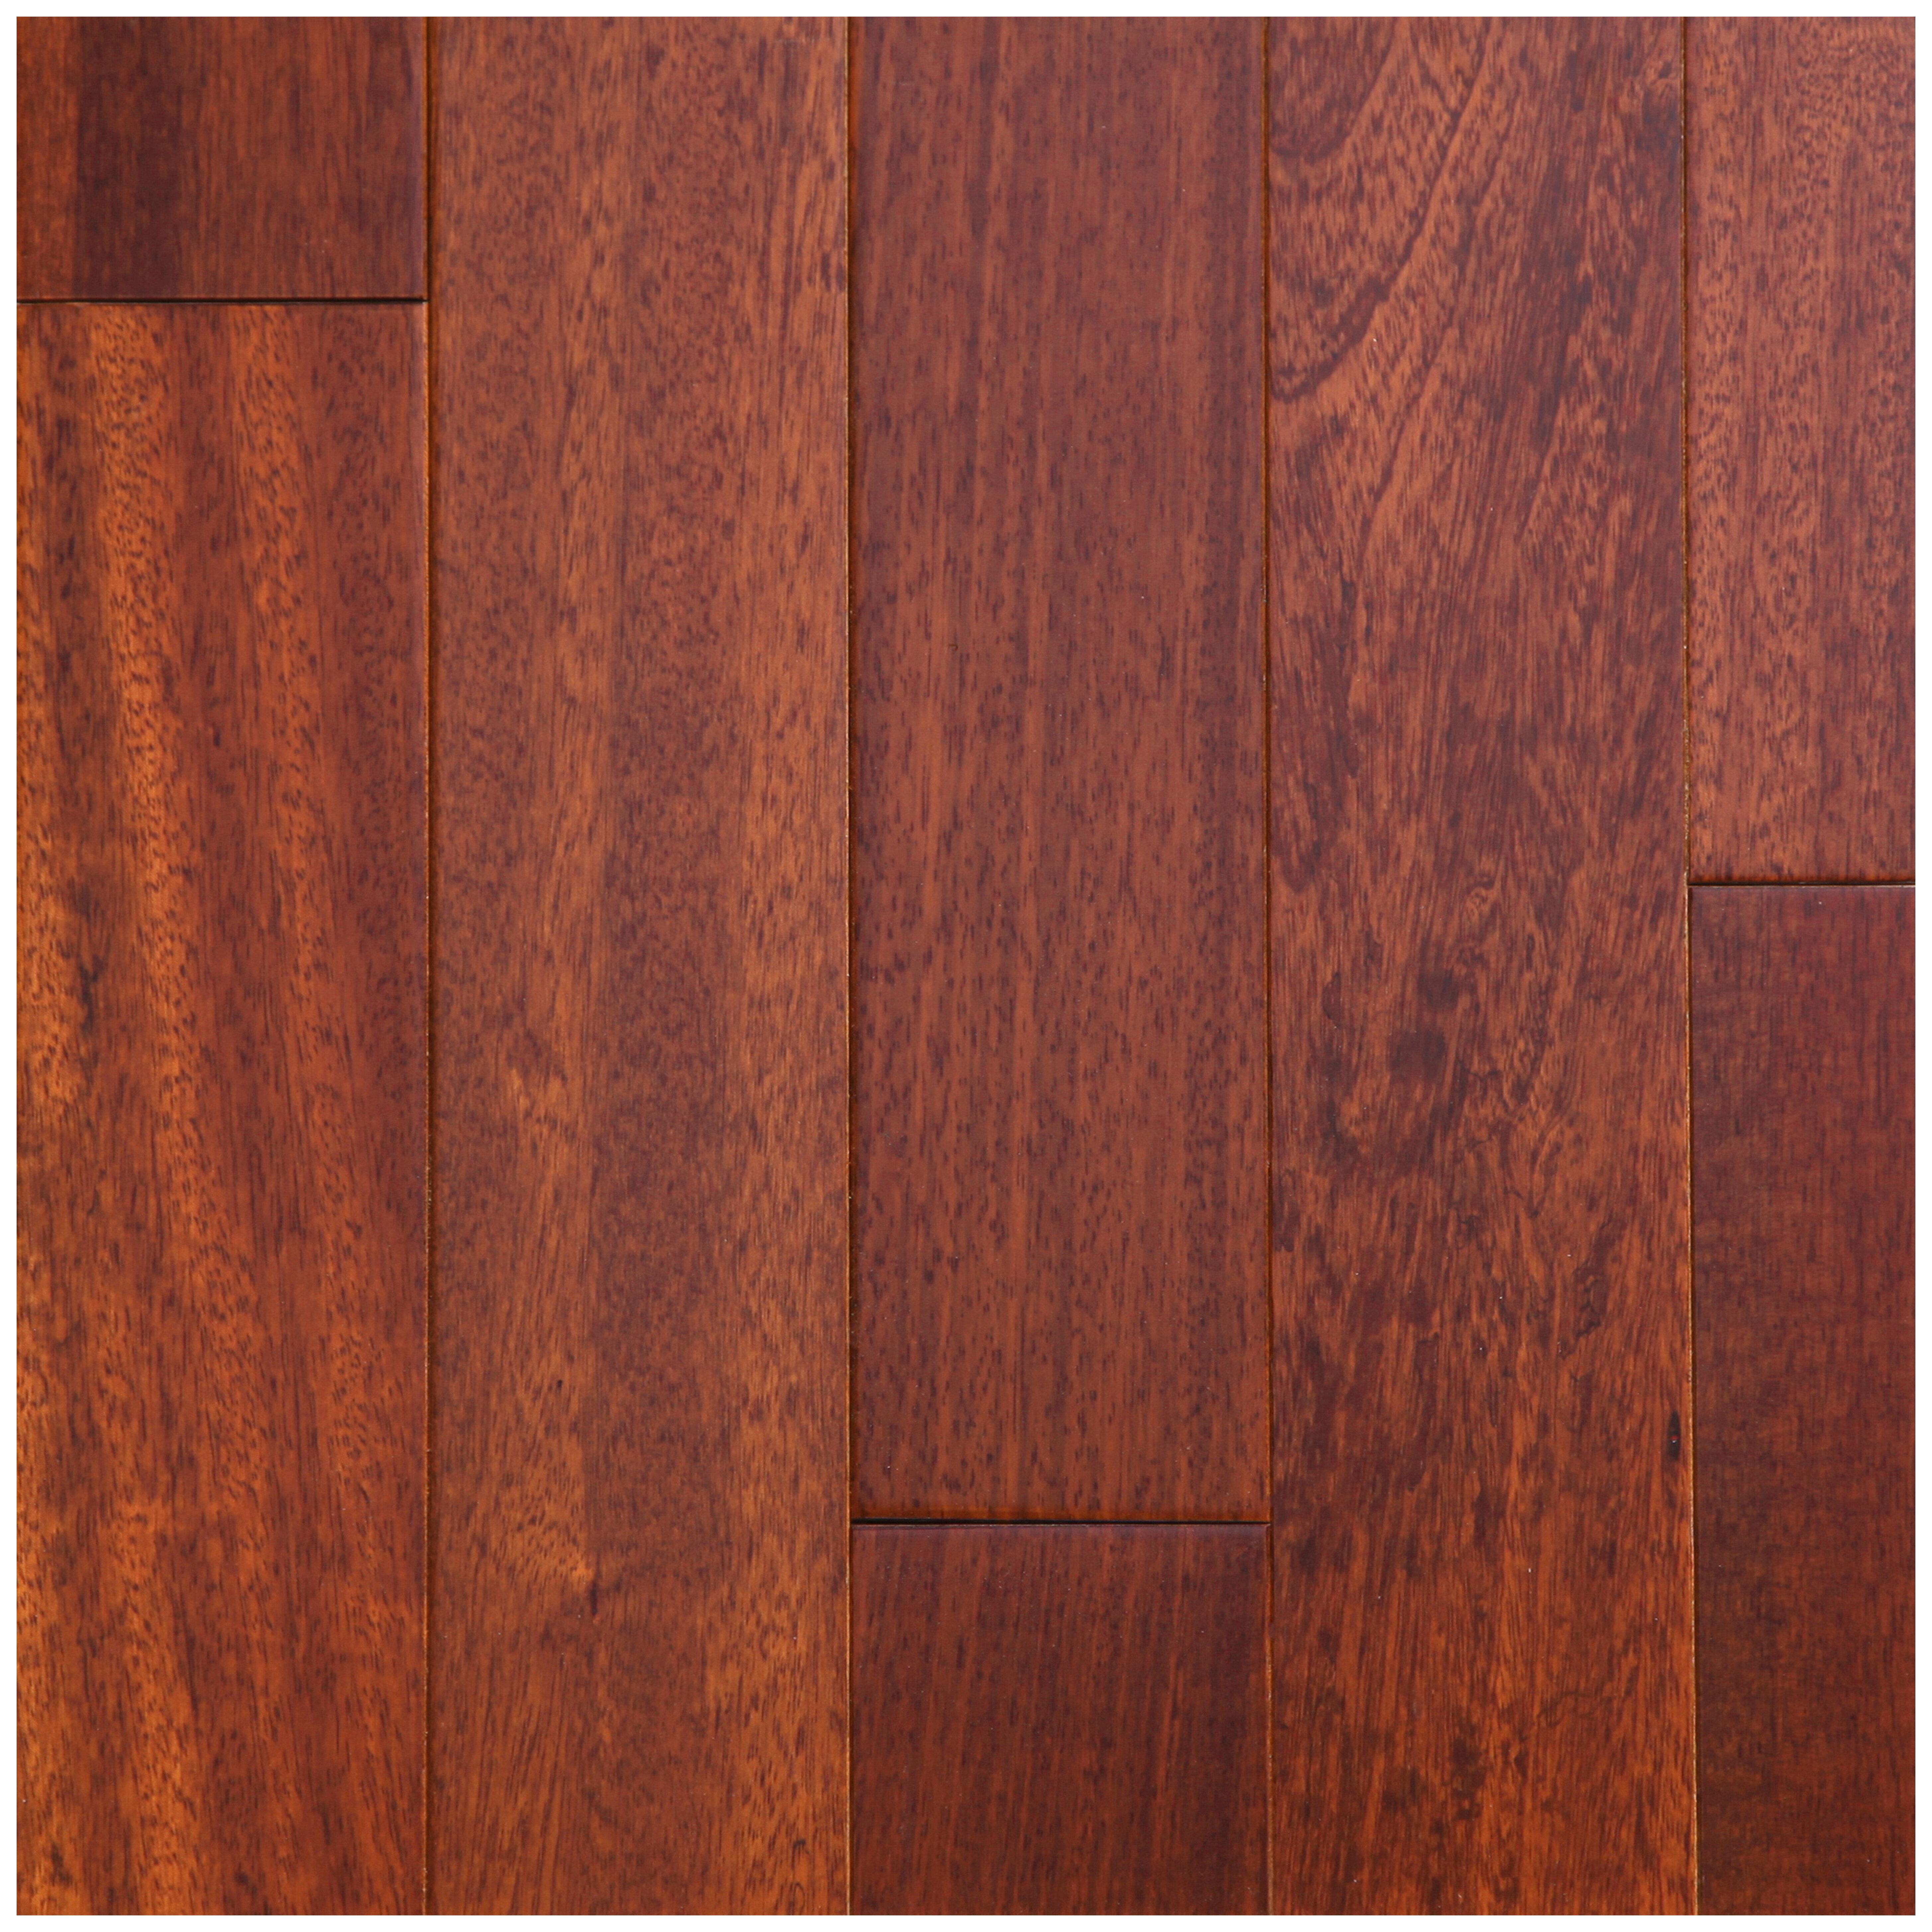 Easoon Usa 3 5 8 Engineered Brazilian Cherry Hardwood Flooring In Clic Reviews Wayfair